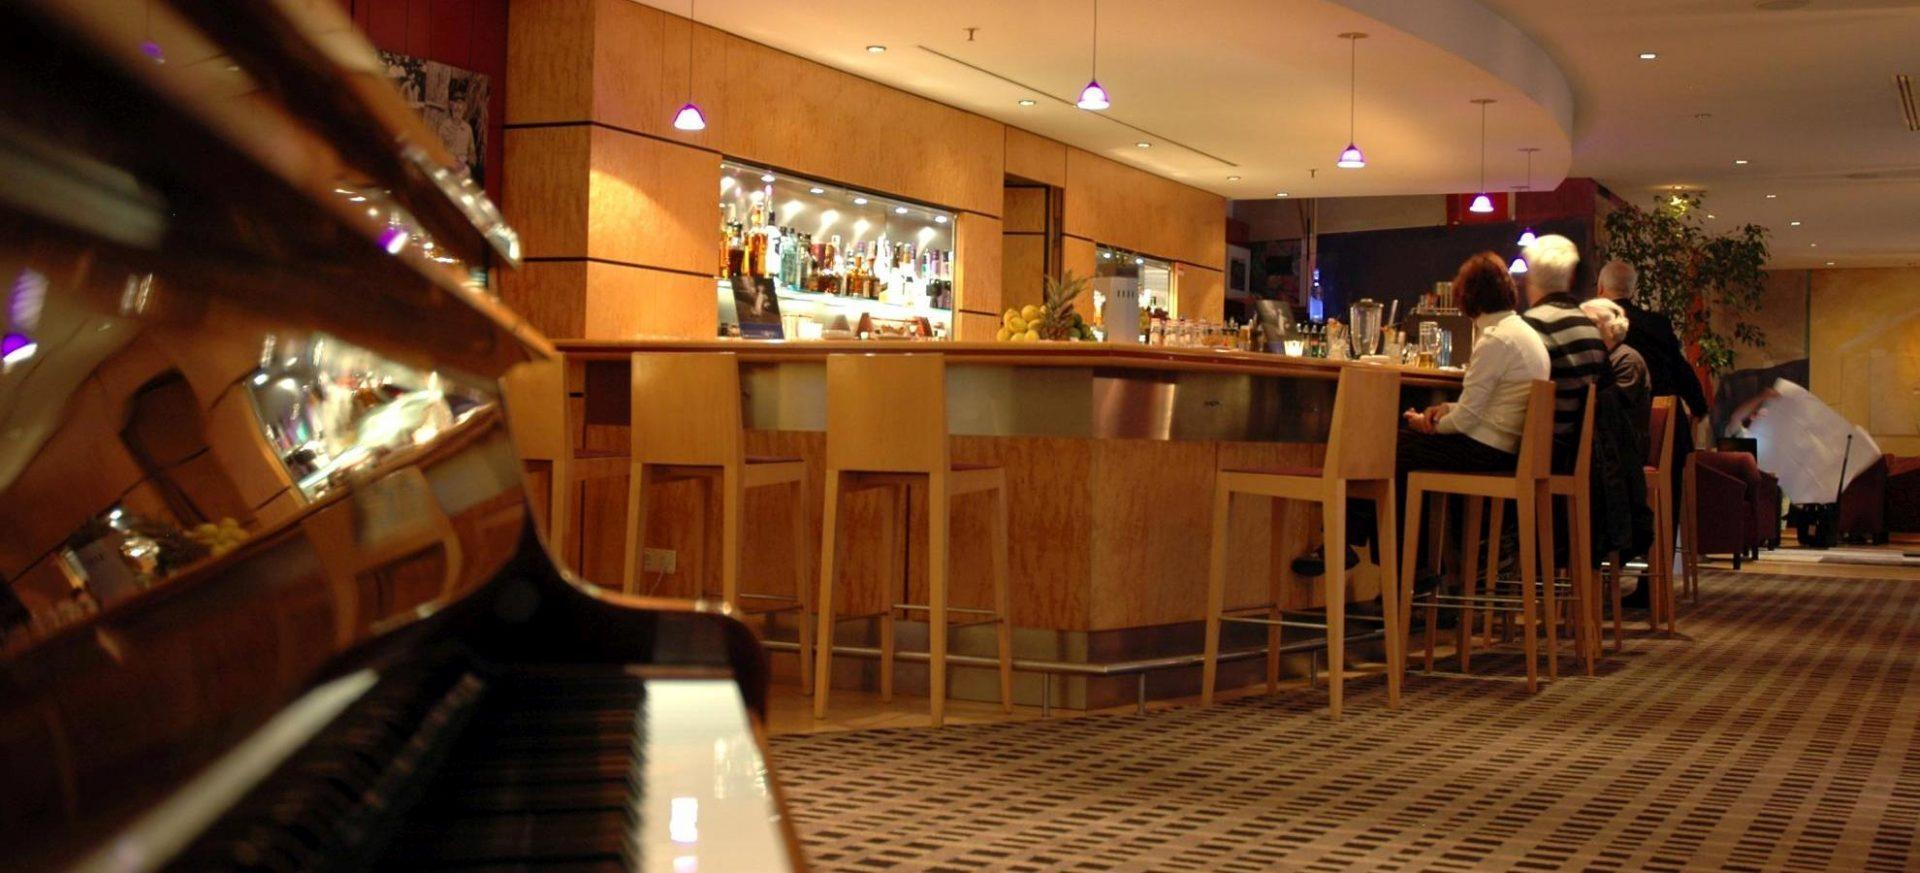 Radisson Blu Hotel Erfurt Bar